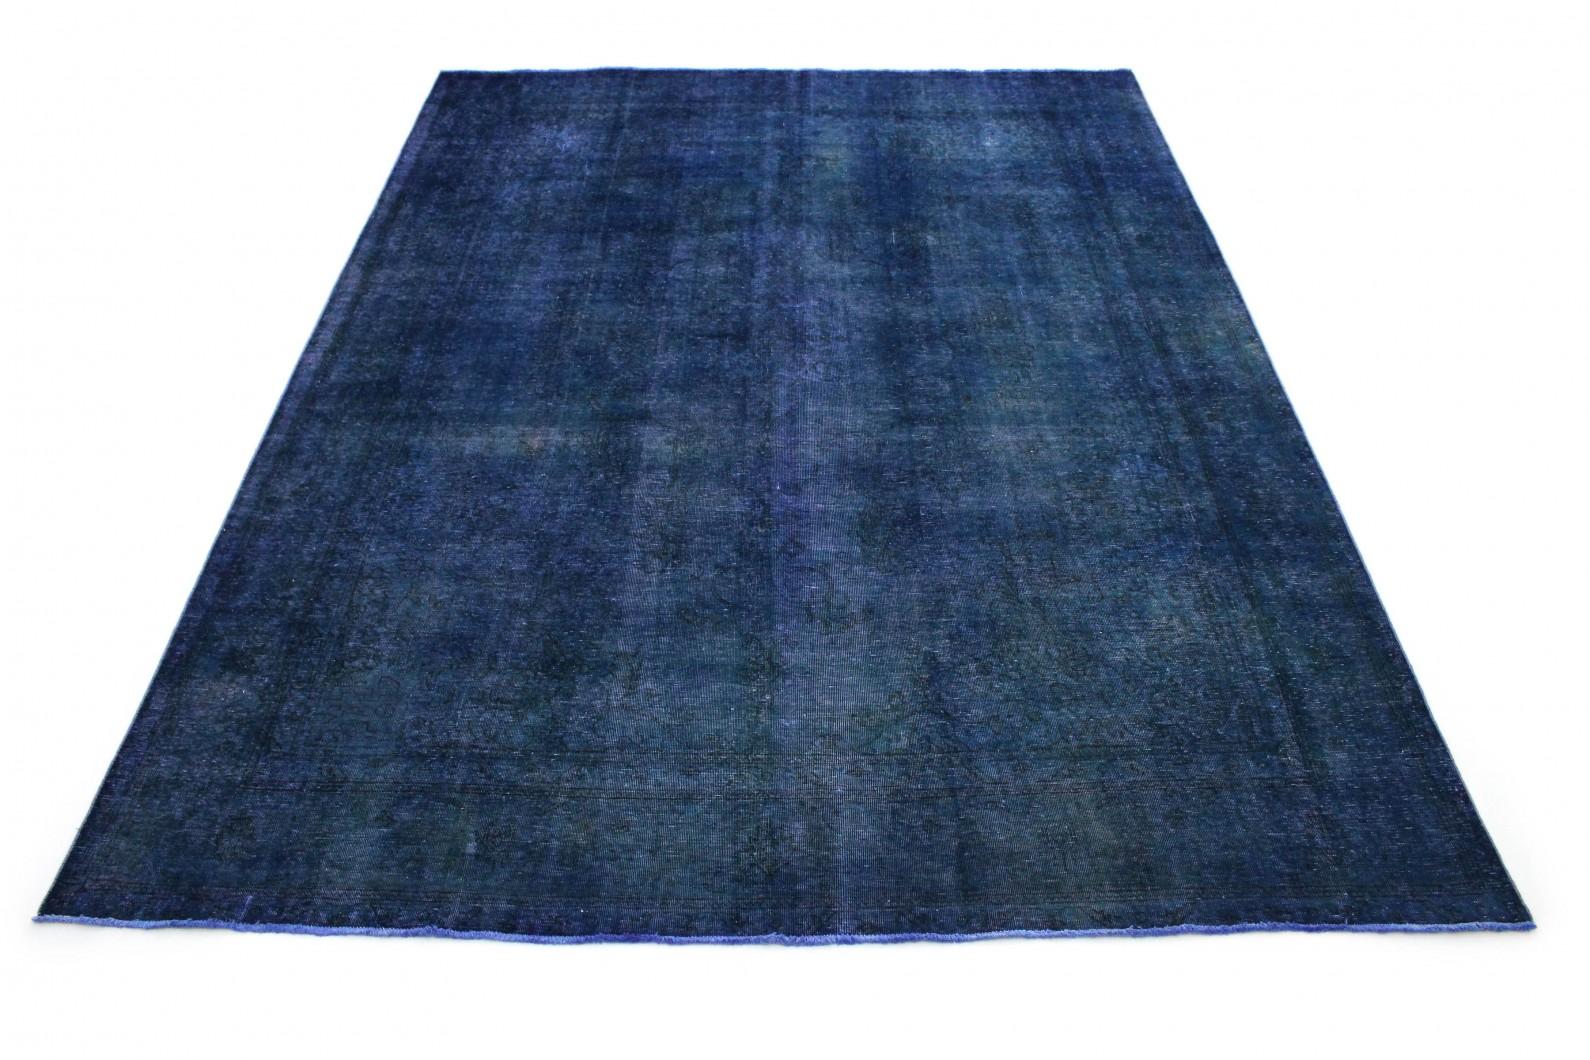 Vintage Teppich Blau in 410x310 (1 / 6)